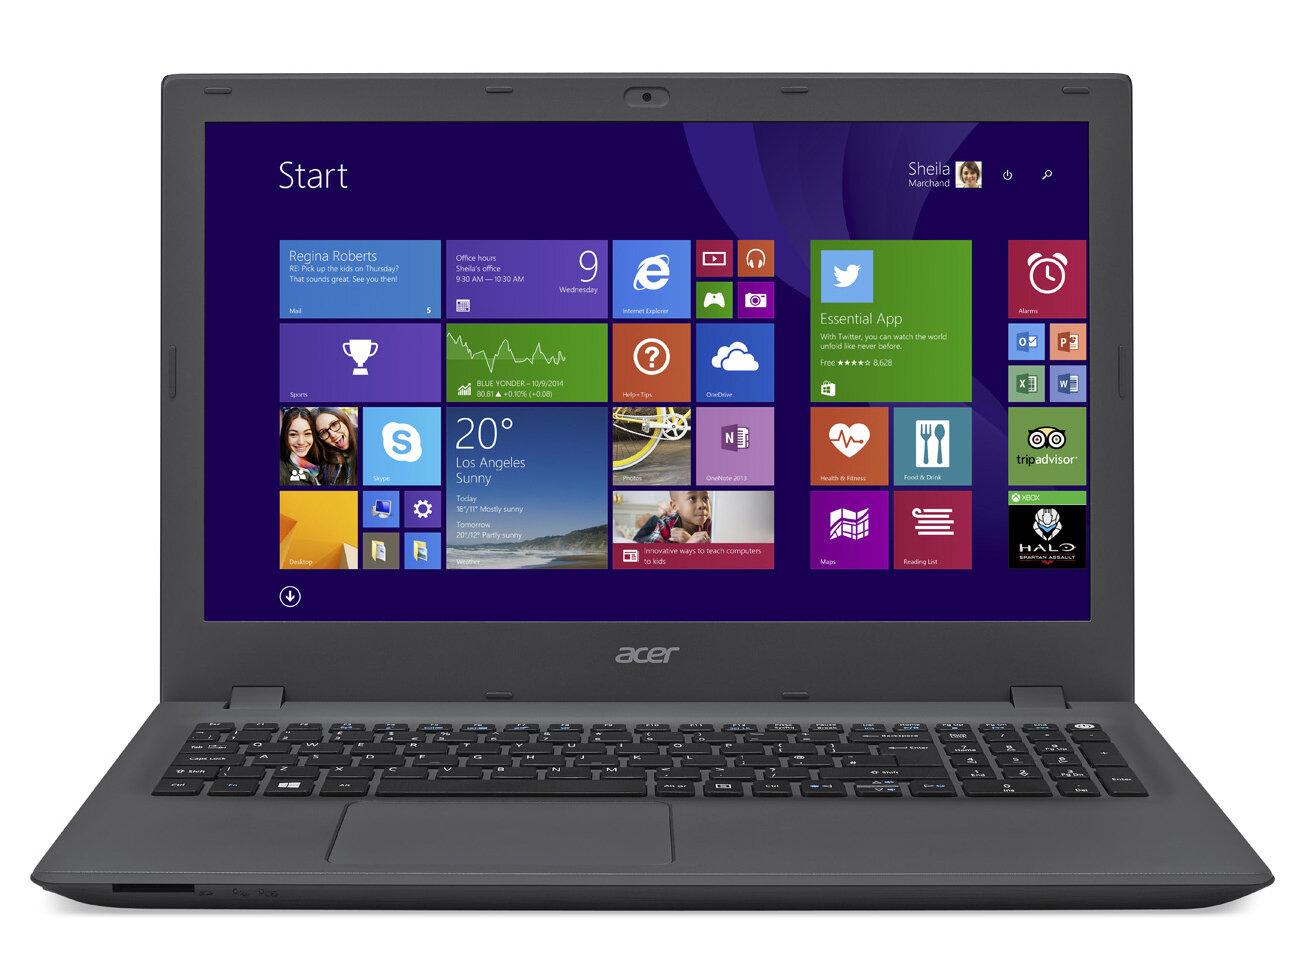 Laptop Acer Aspire E5-491G-51AW NX.GA8SV.002 - Core i5-6300HQ, Ram 4GB, HDD 500GB